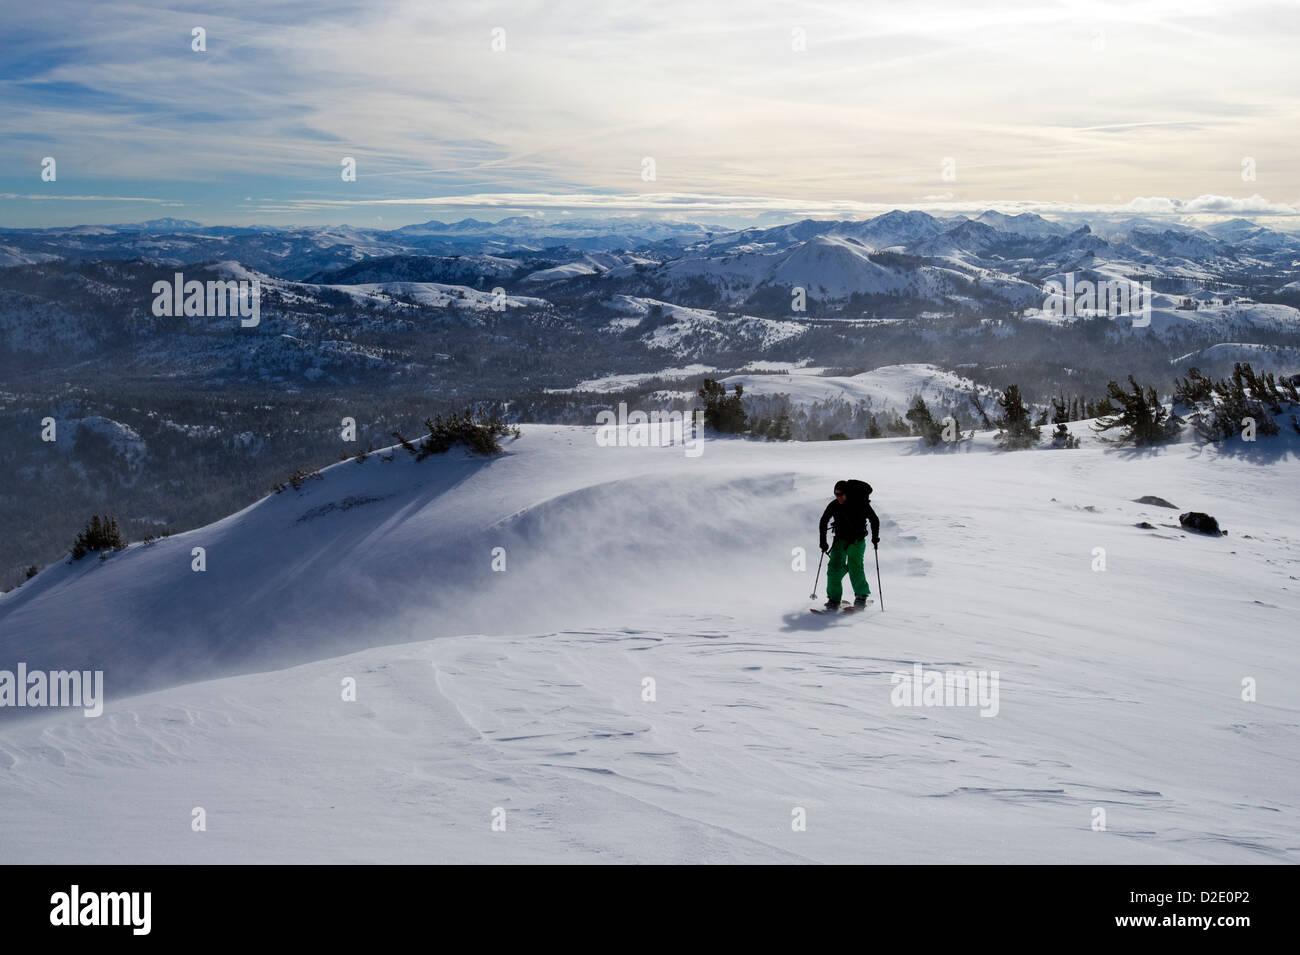 A snowboarder on a splitboard skins up Red Lake Peak in high winds near Lake Tahoe, CA. Stock Photo